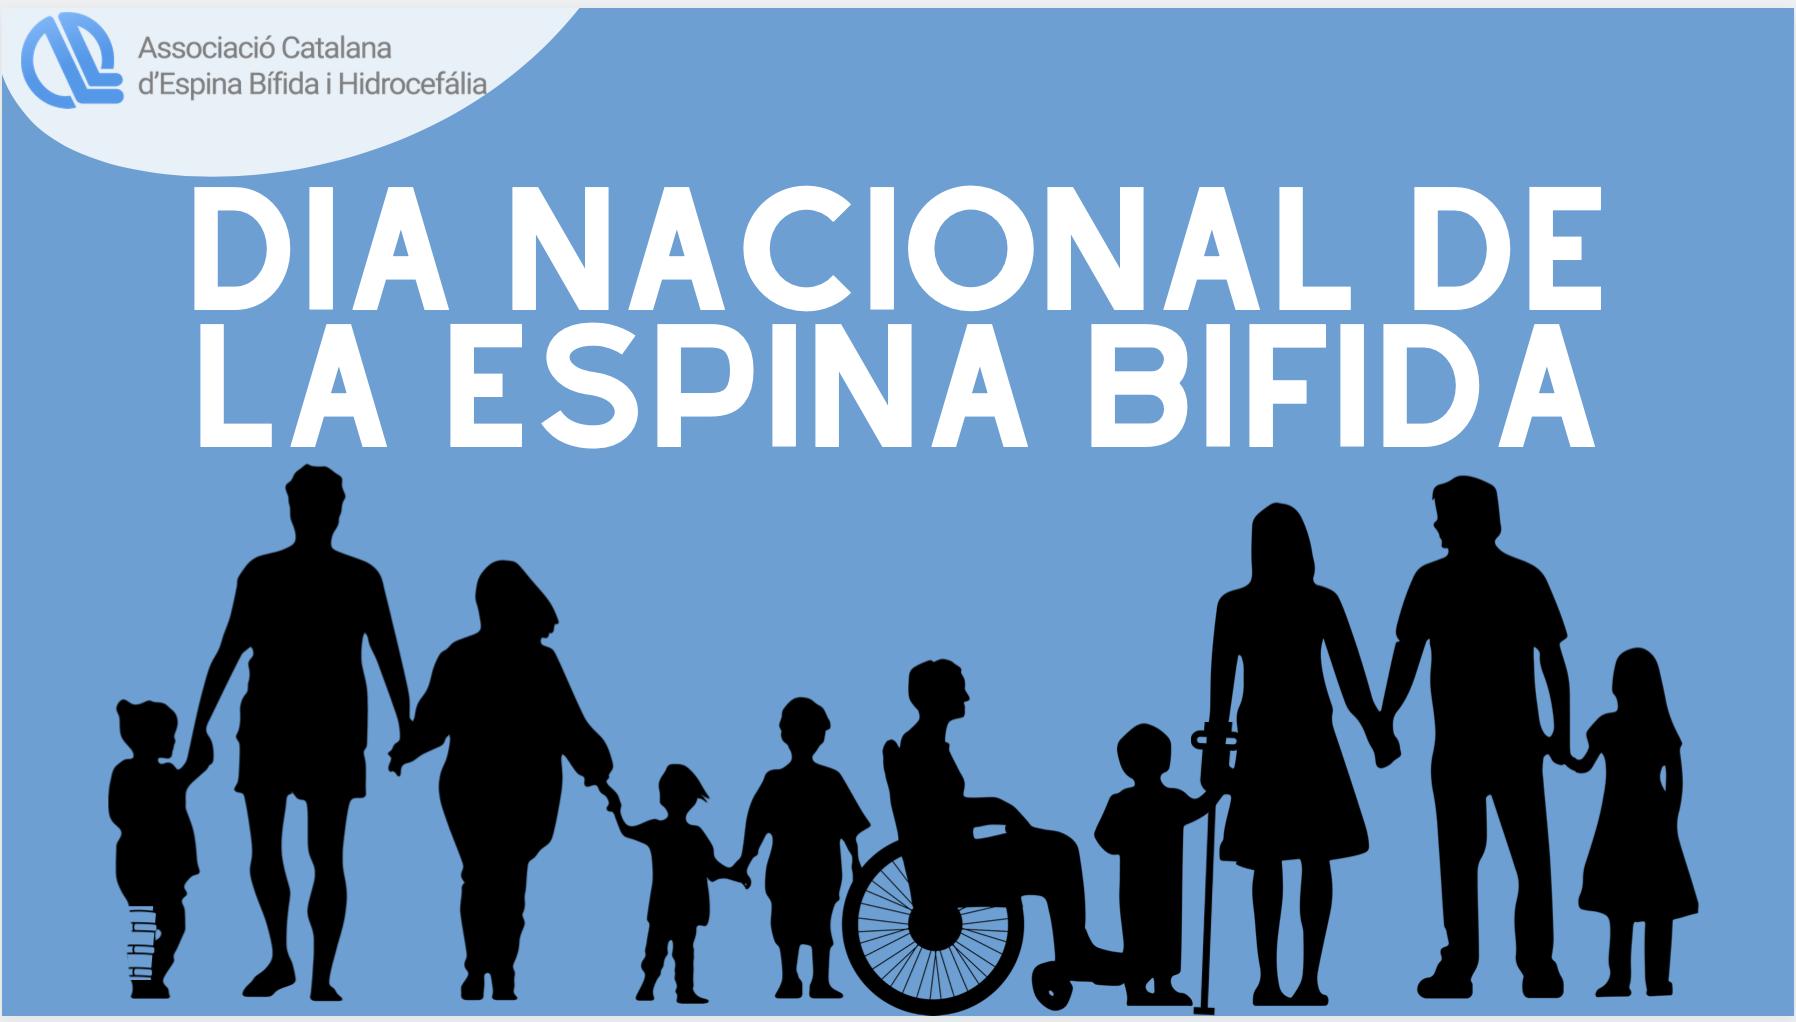 JORNADA DIA NACIONAL DE LA ESPINA BÍFIDA DE LA ACAEBH